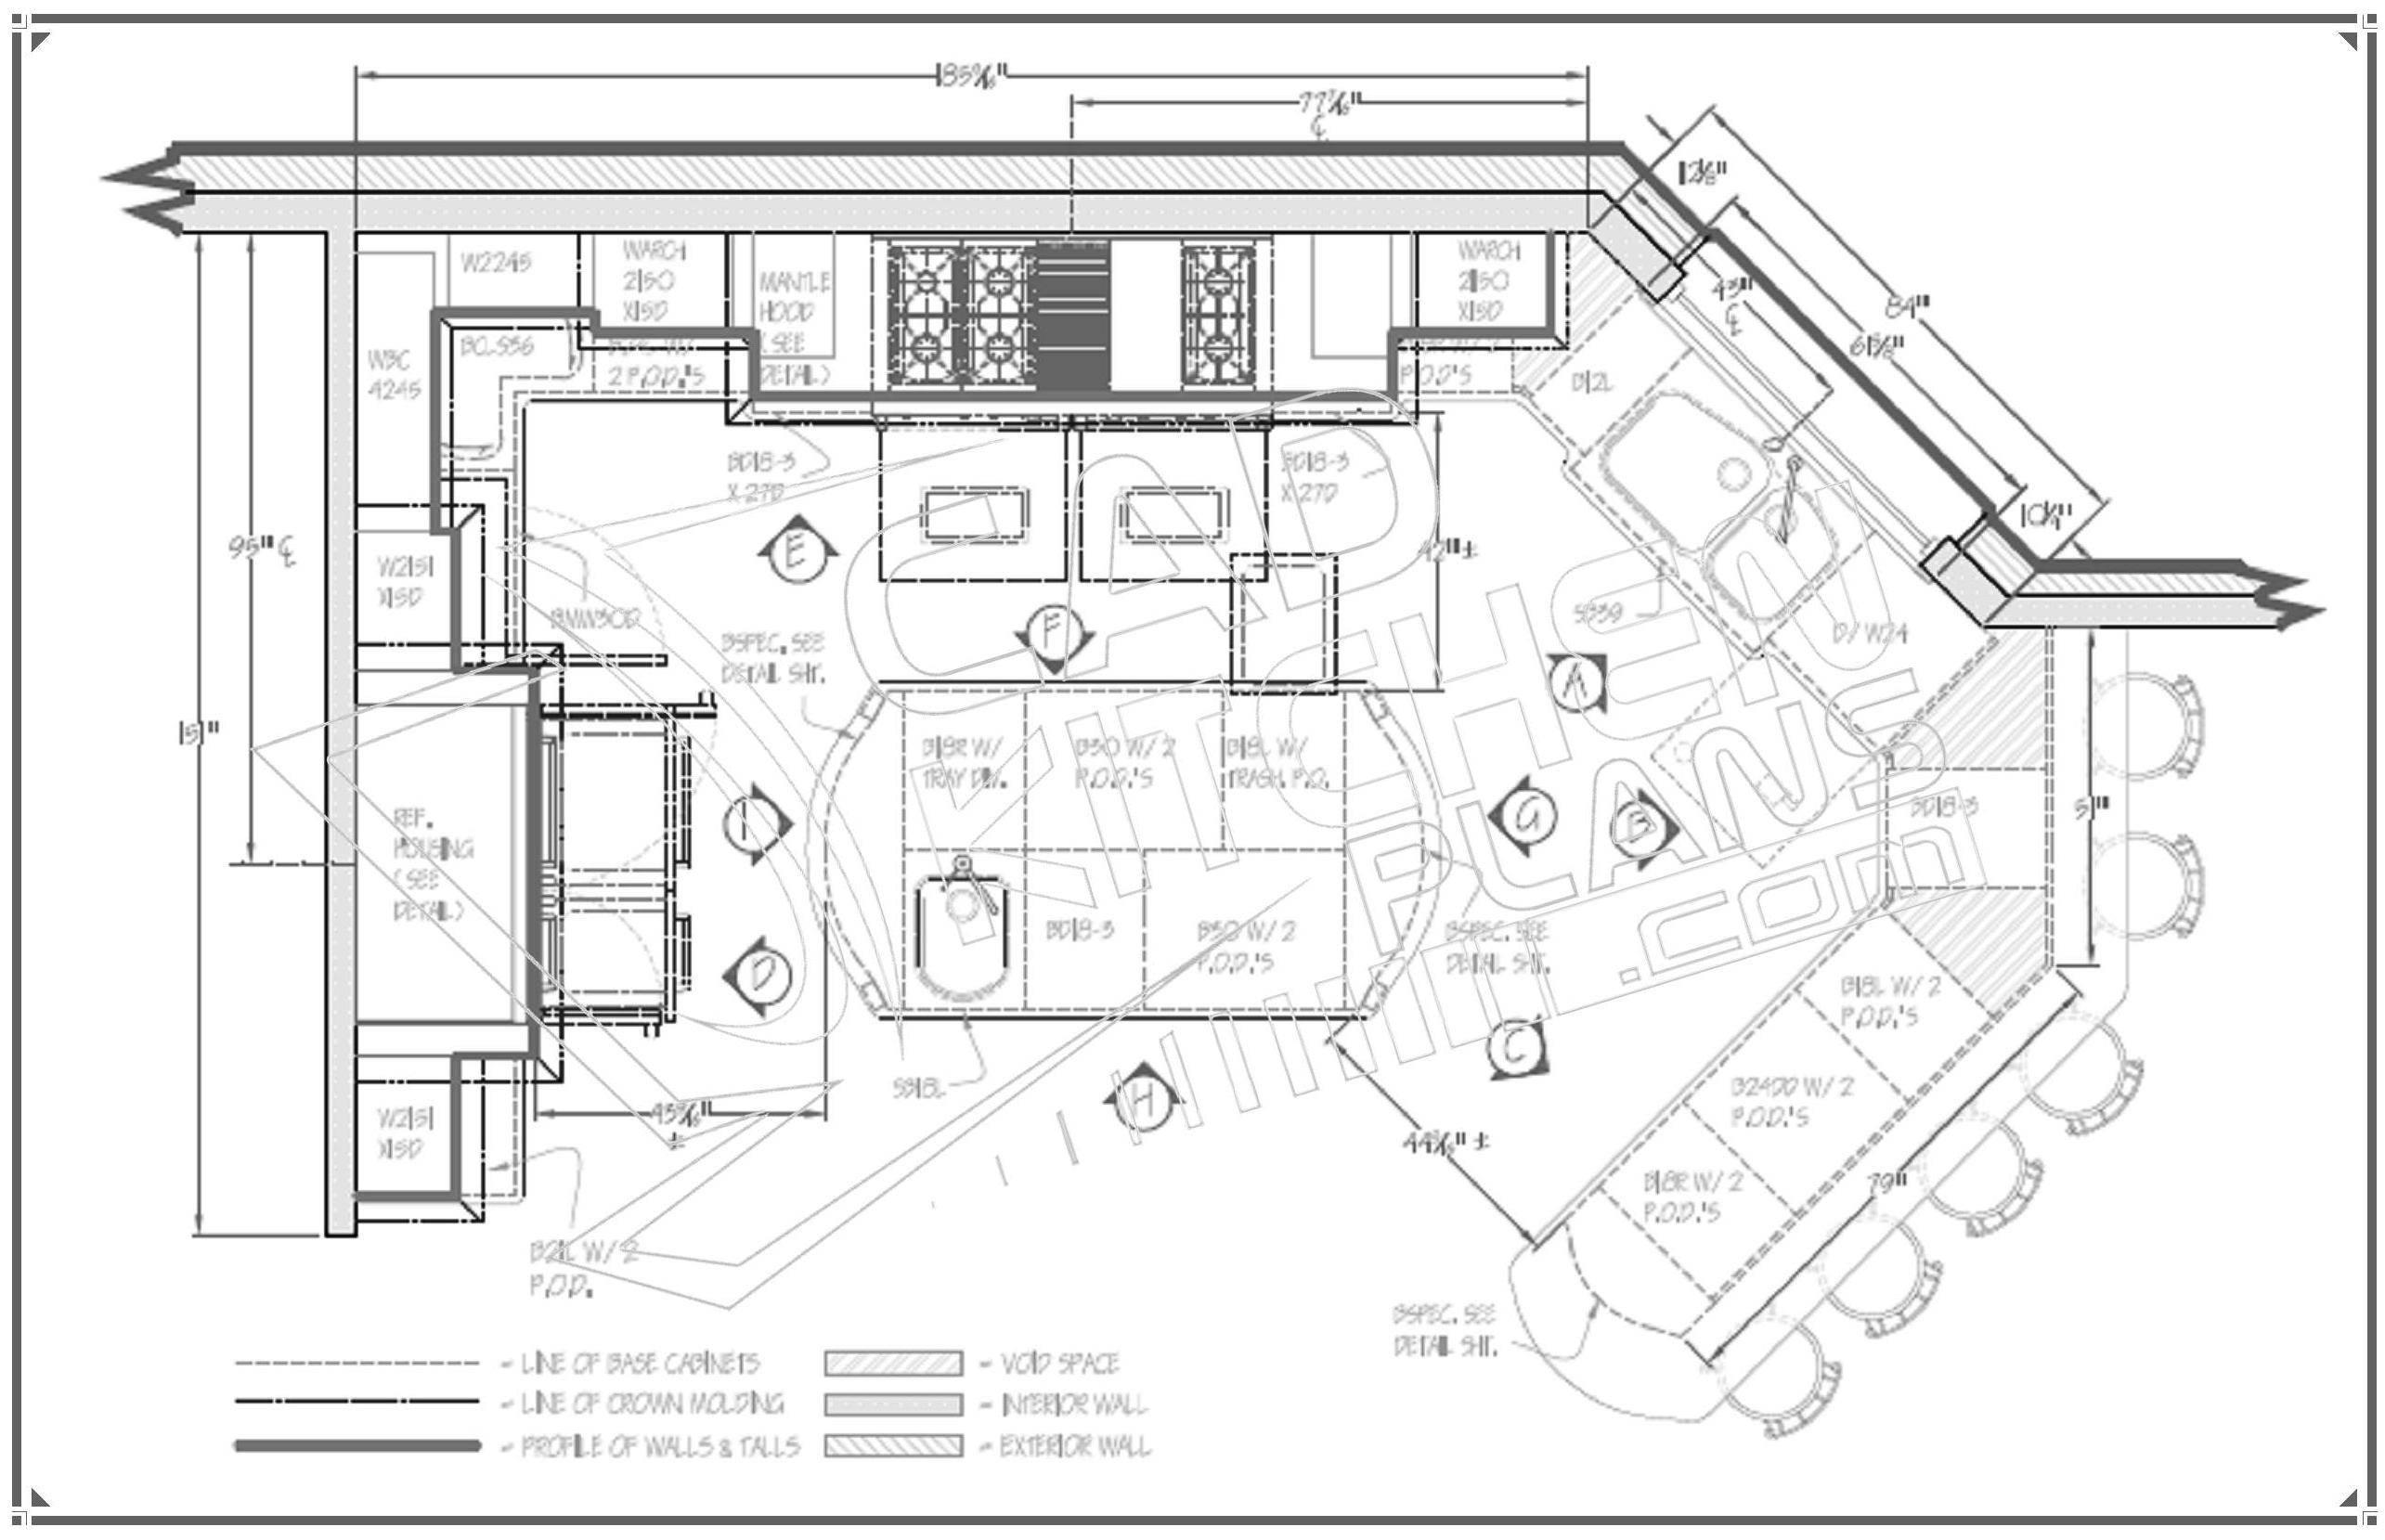 Kitchen Design Floorplans Ideas House Plans 1572